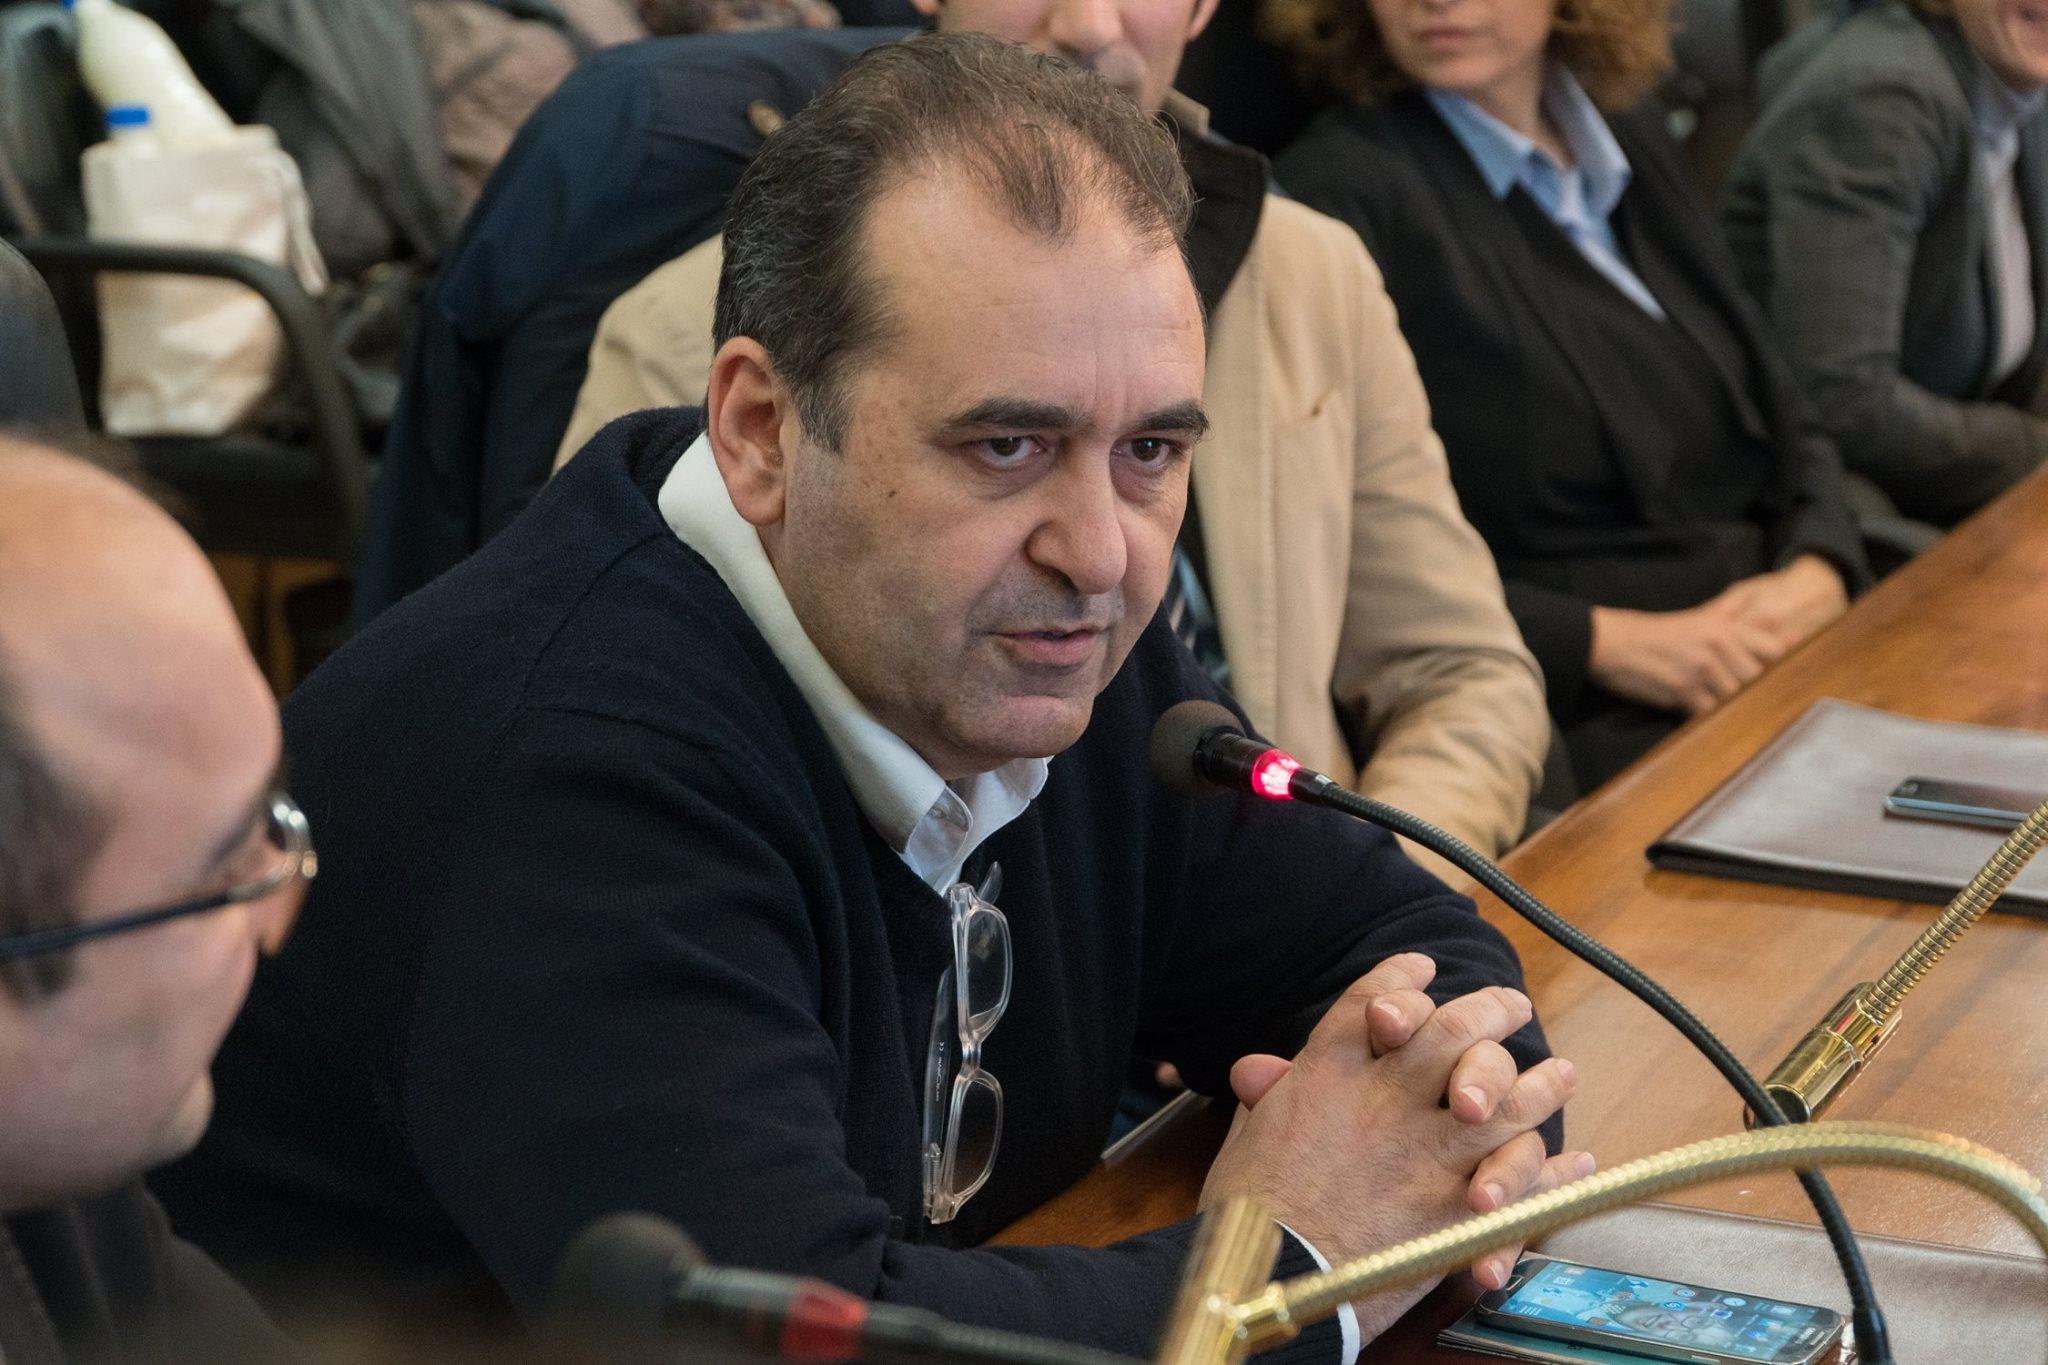 Luigi Derniolo Presidente Confartigianato Lecce